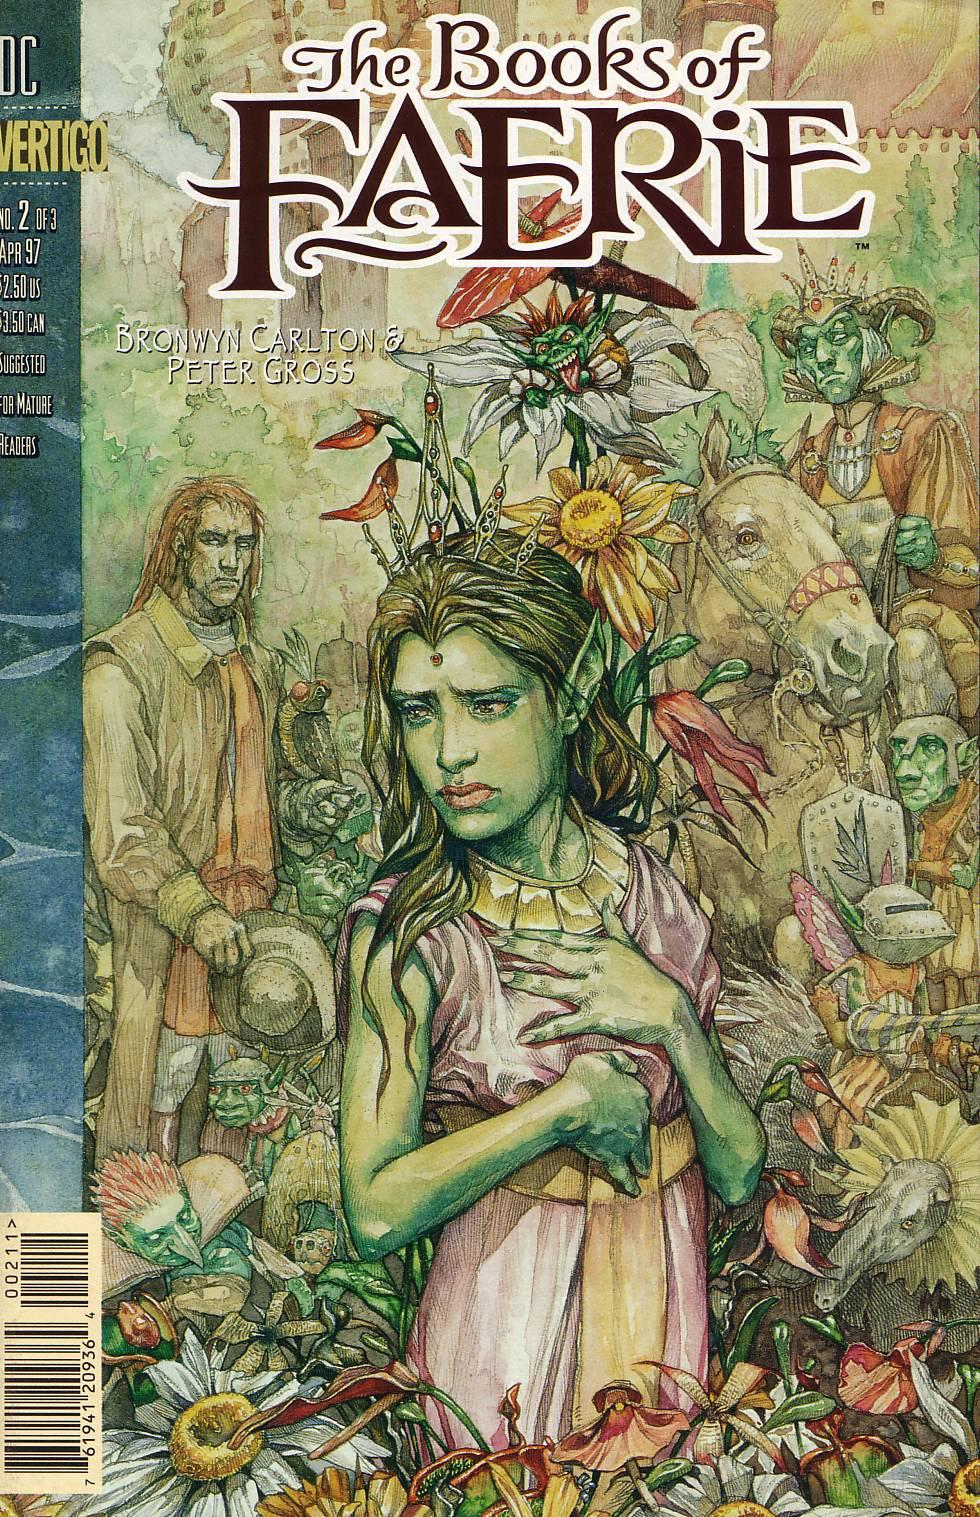 The Books of Faerie Vol 1 2